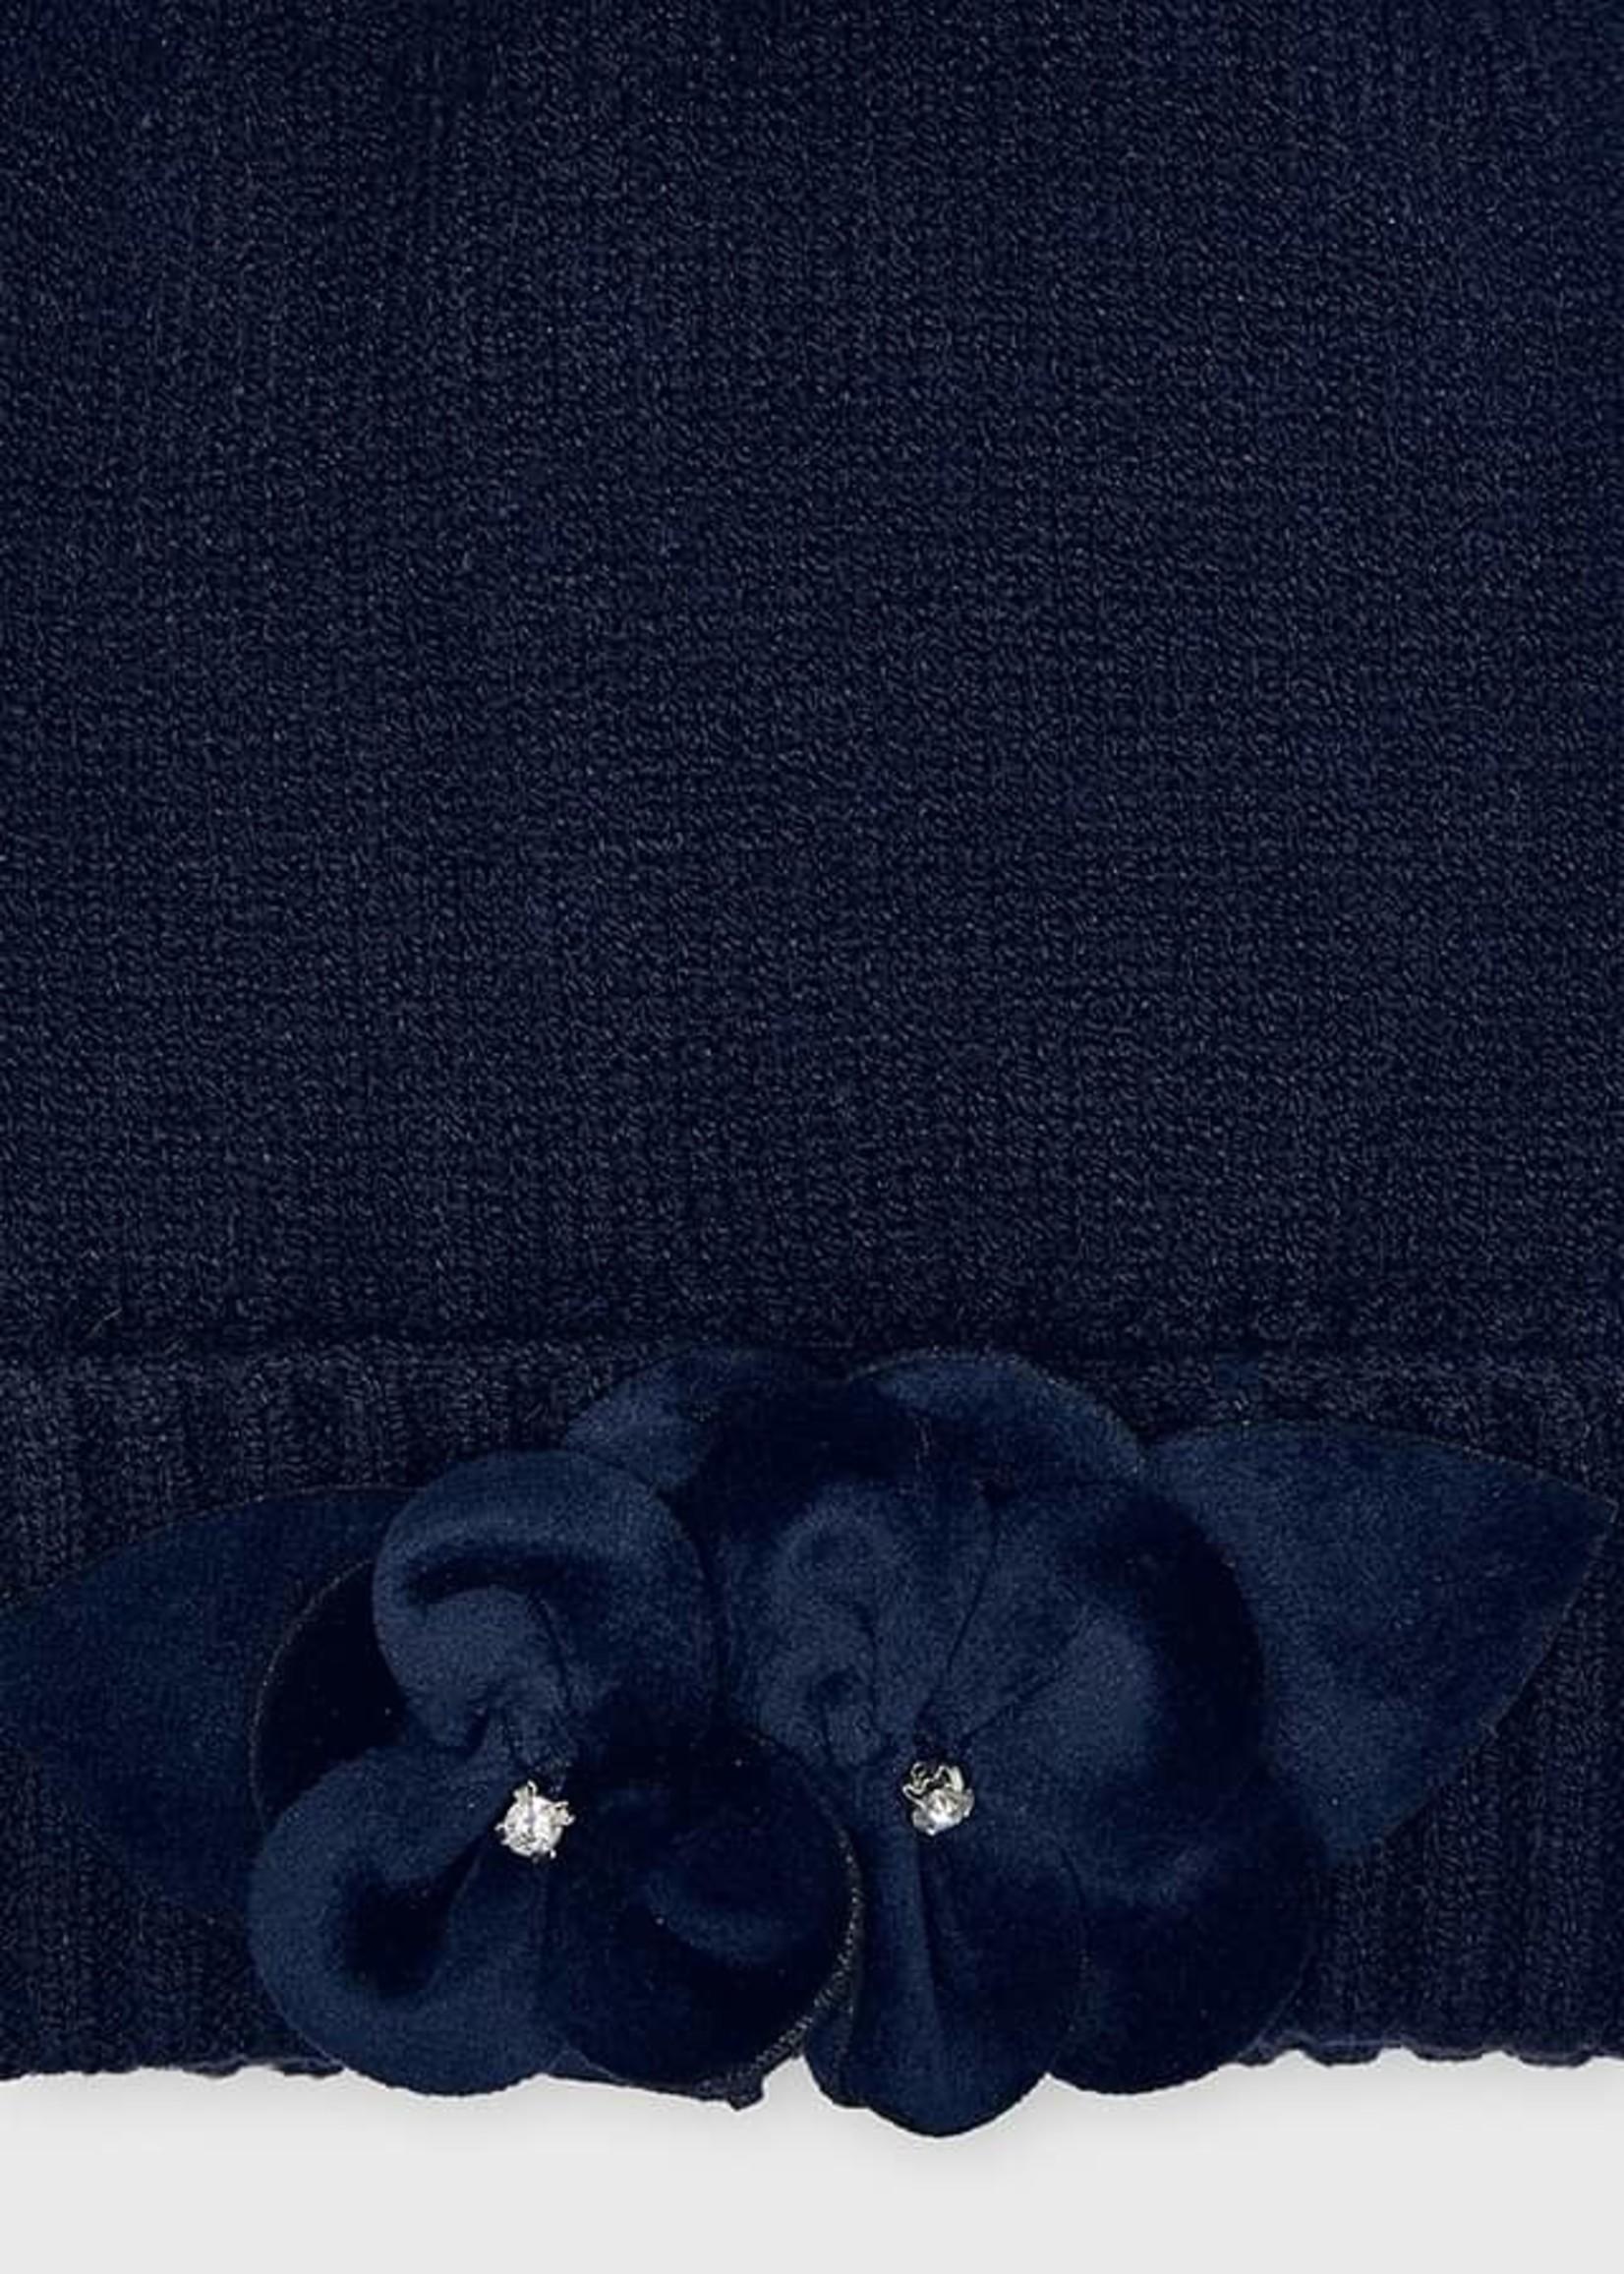 Mayoral Mayoral hat and scarf set navy(pre-order)